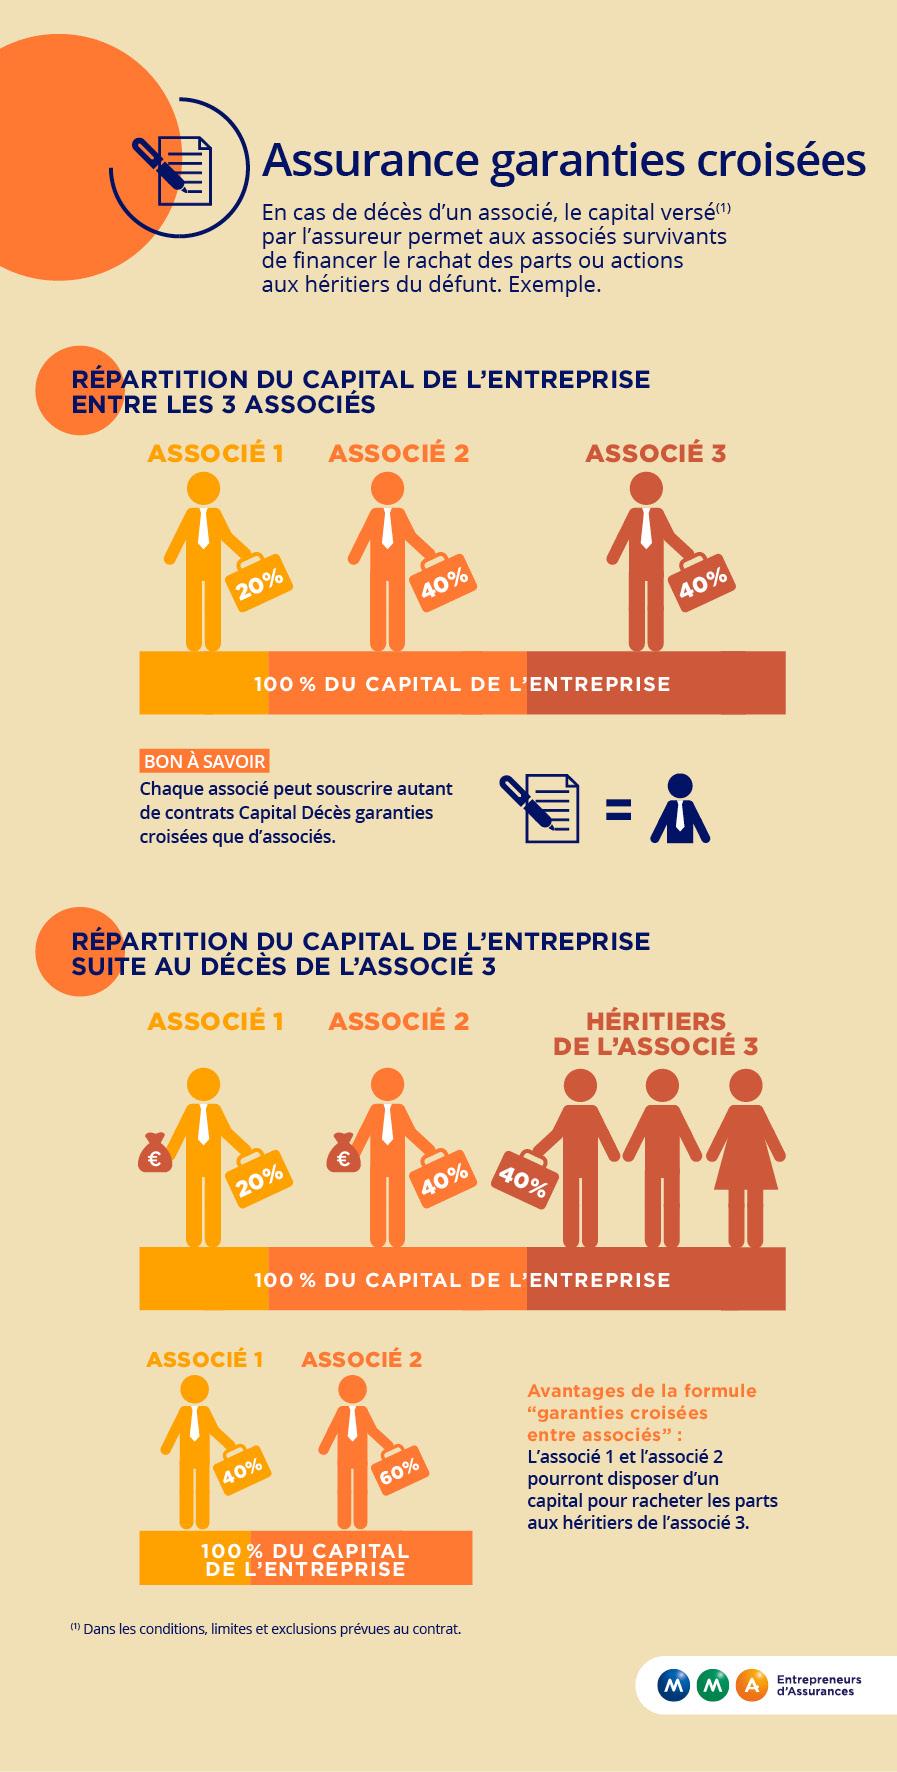 infographie mma garanties croisées